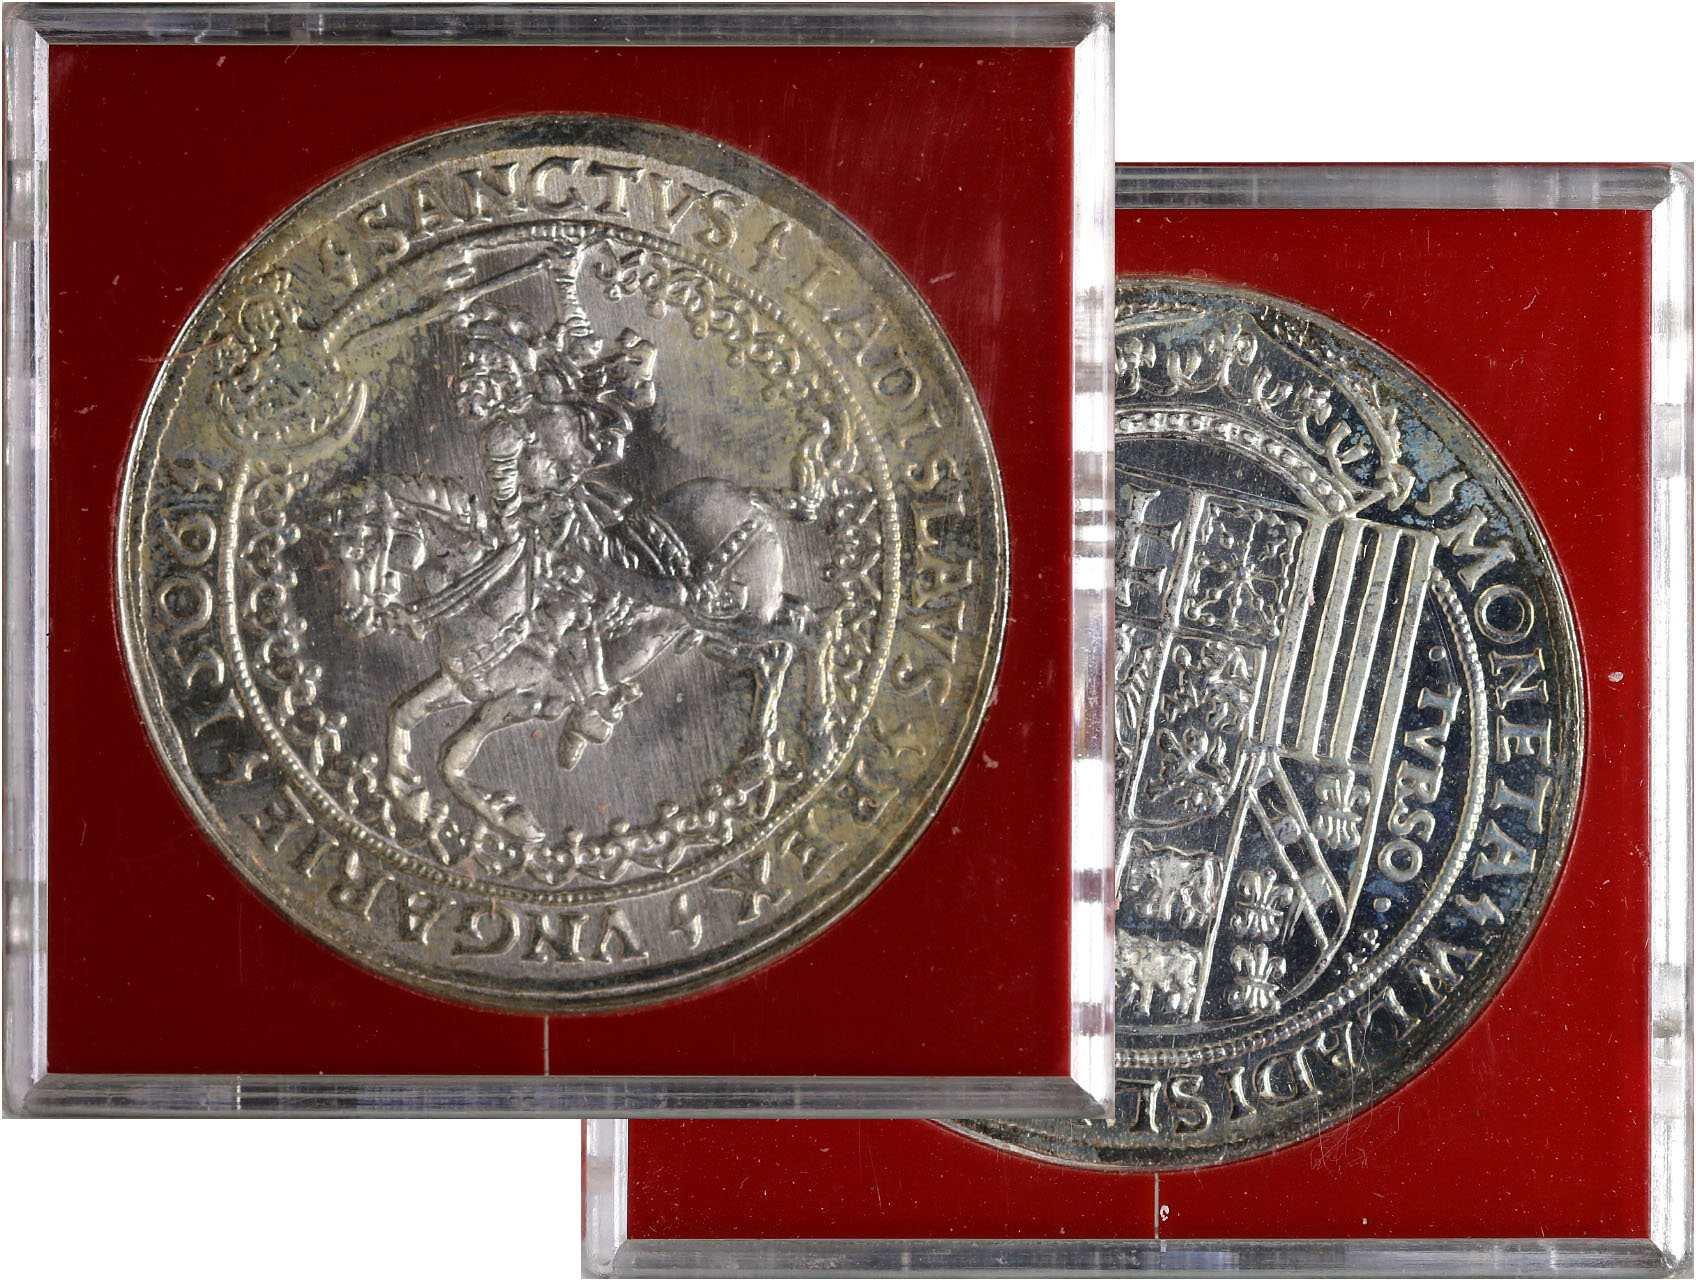 Kremnice, Ag replika Tolaru 1506, etue, obal a certifikát č.1435 Artia